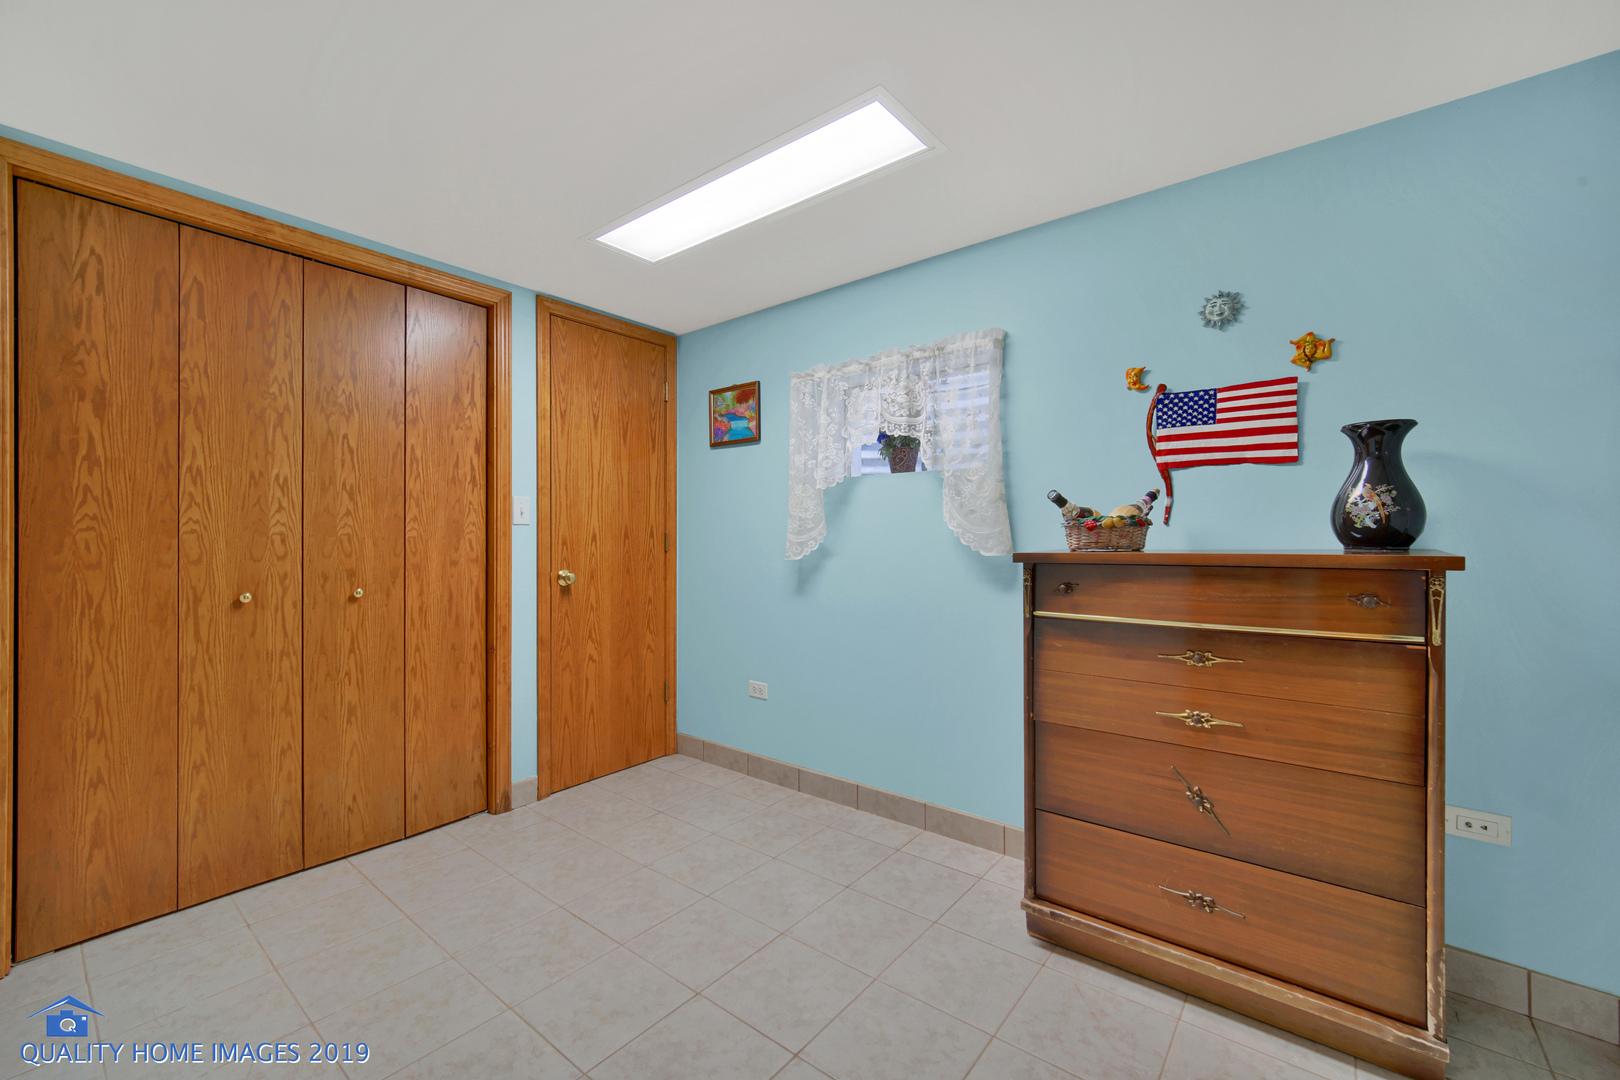 306 South Meier, Mount Prospect, Illinois, 60056